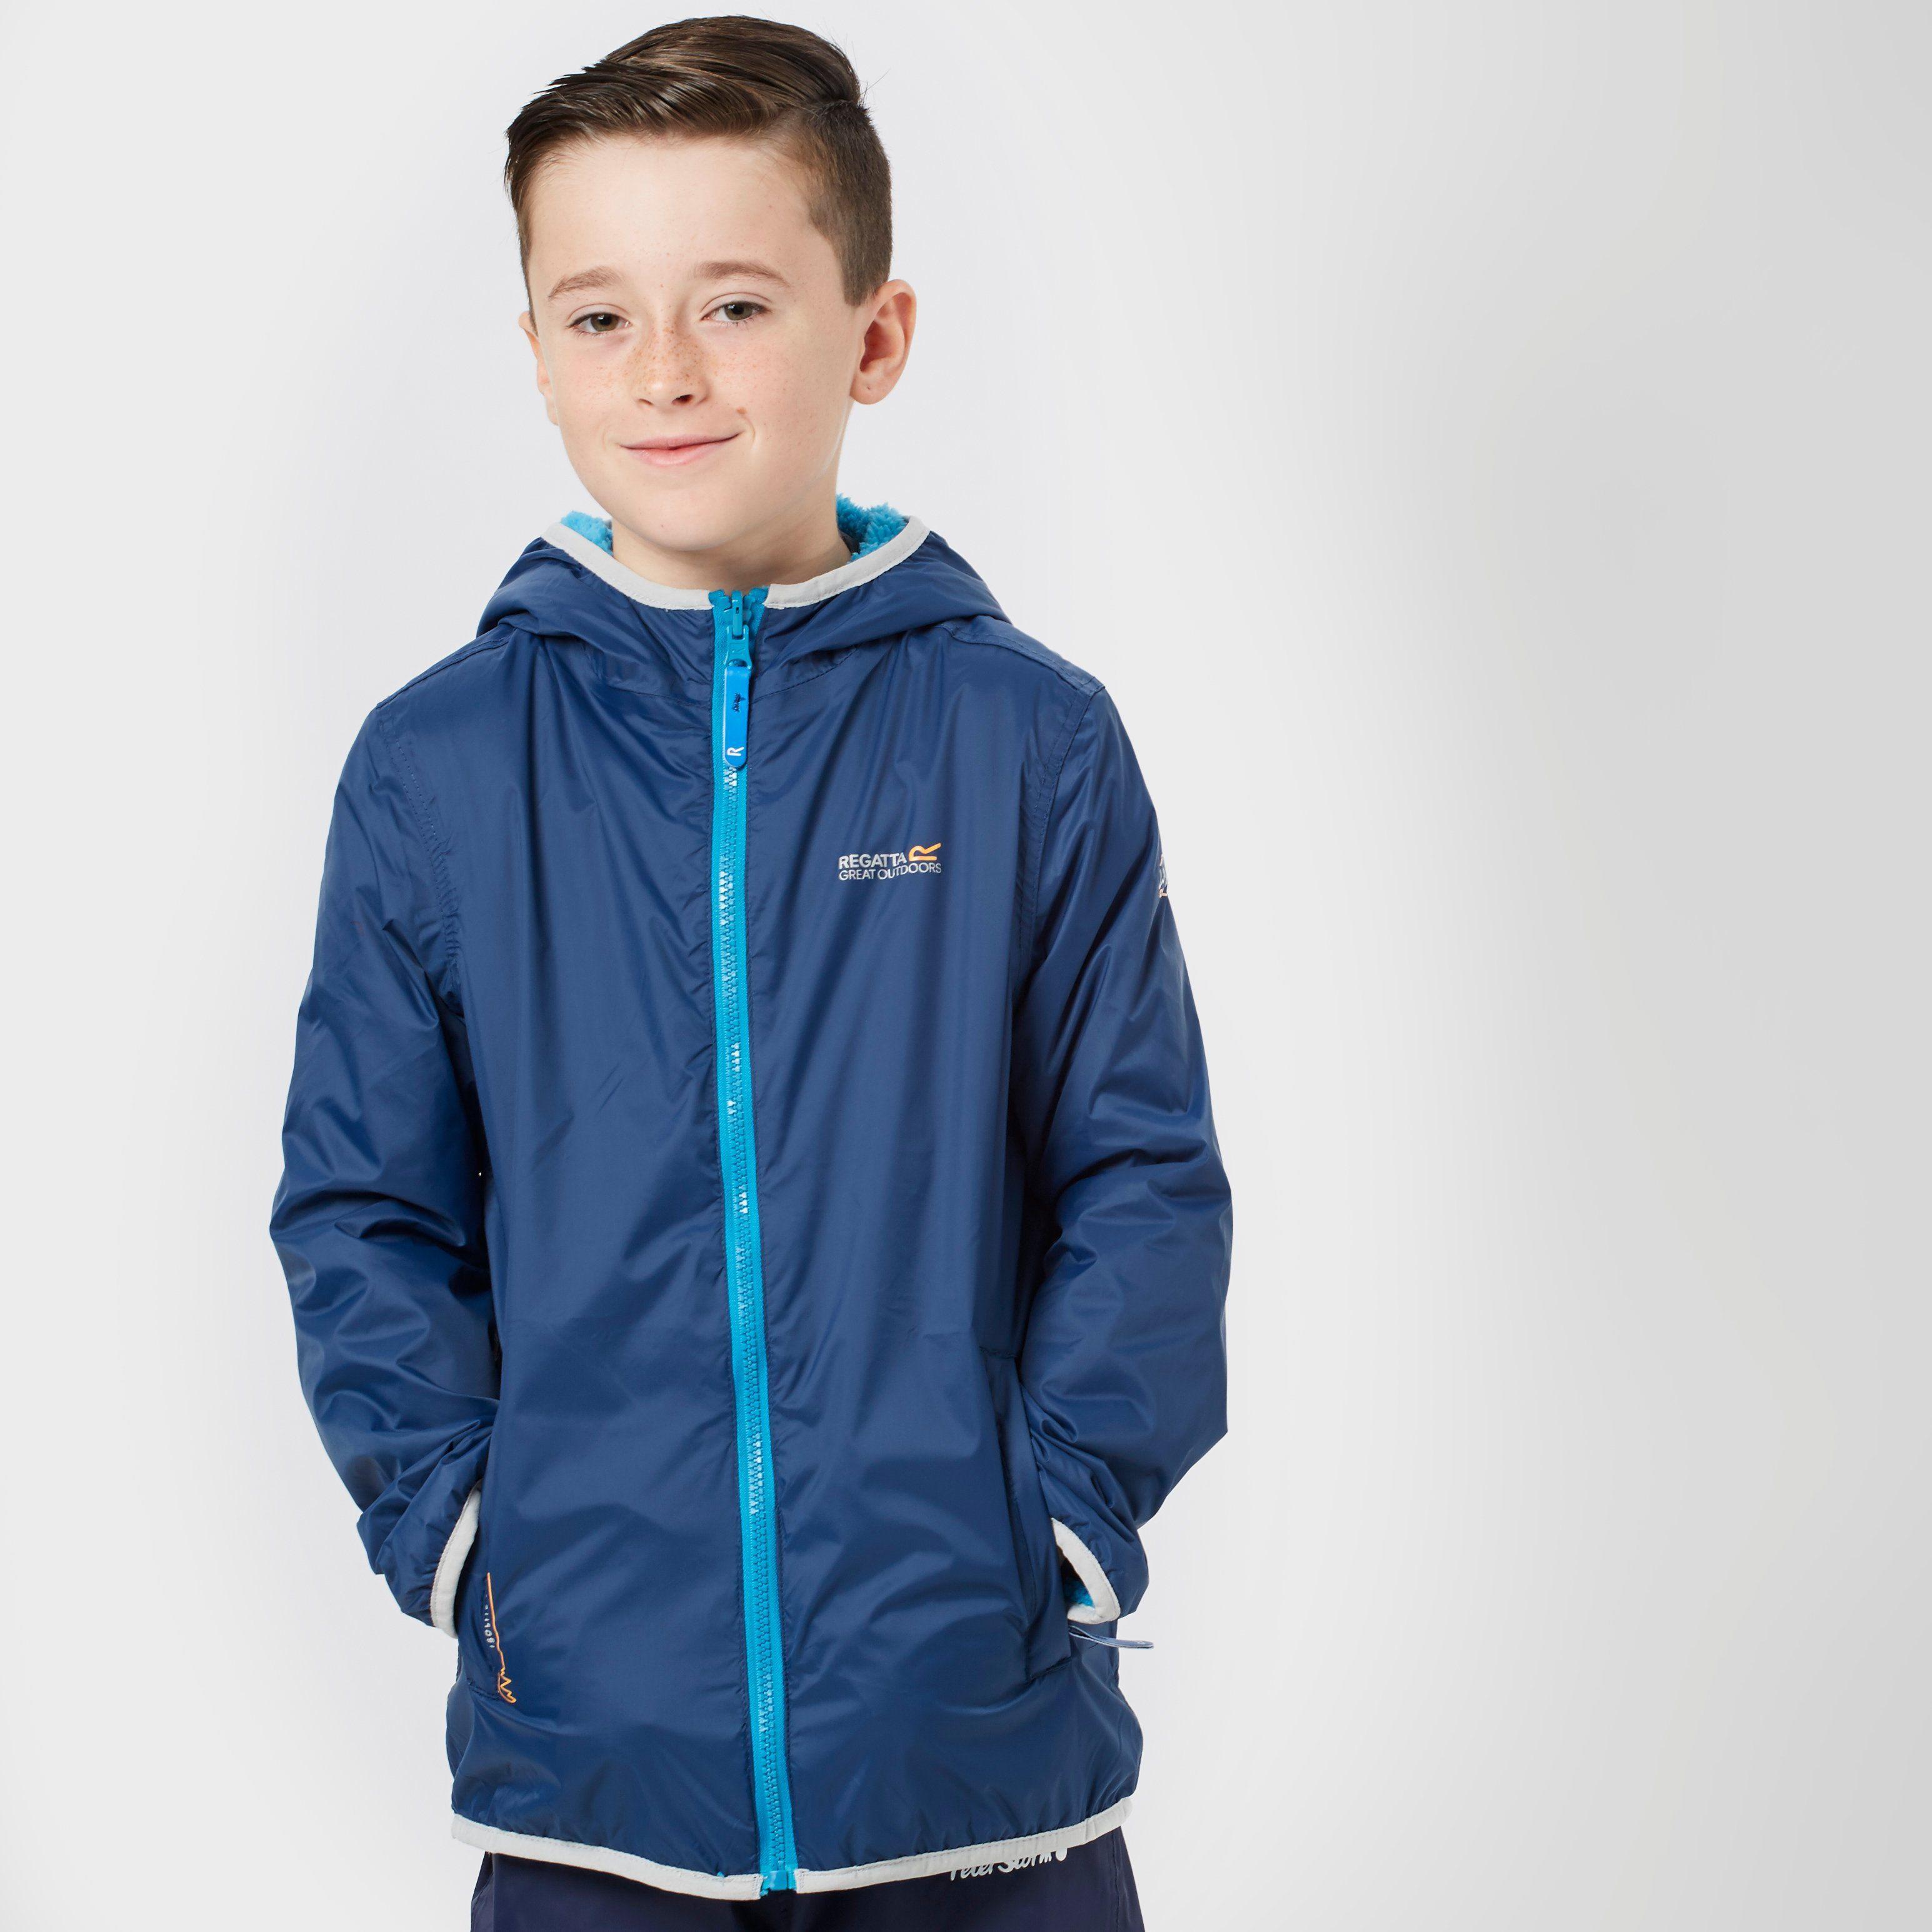 REGATTA Boy's Lagoona Jacket